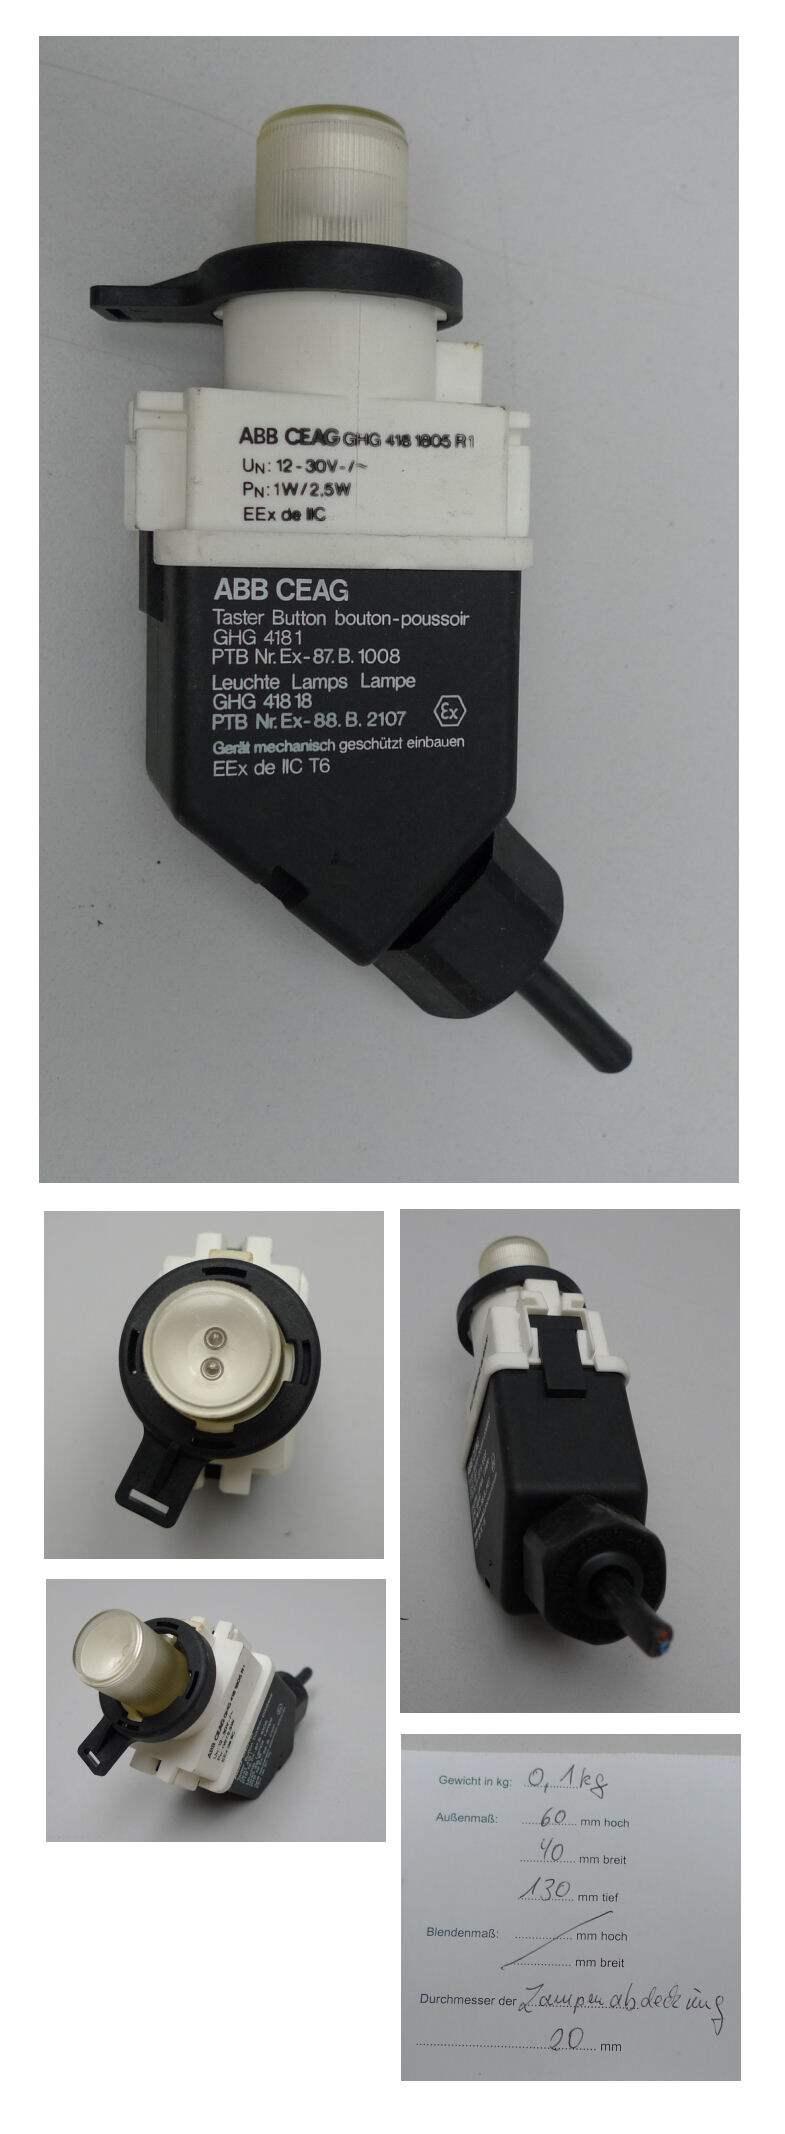 ly73 abb ceag ex ghg 418 1805 ghg418 18 lampe strahler. Black Bedroom Furniture Sets. Home Design Ideas